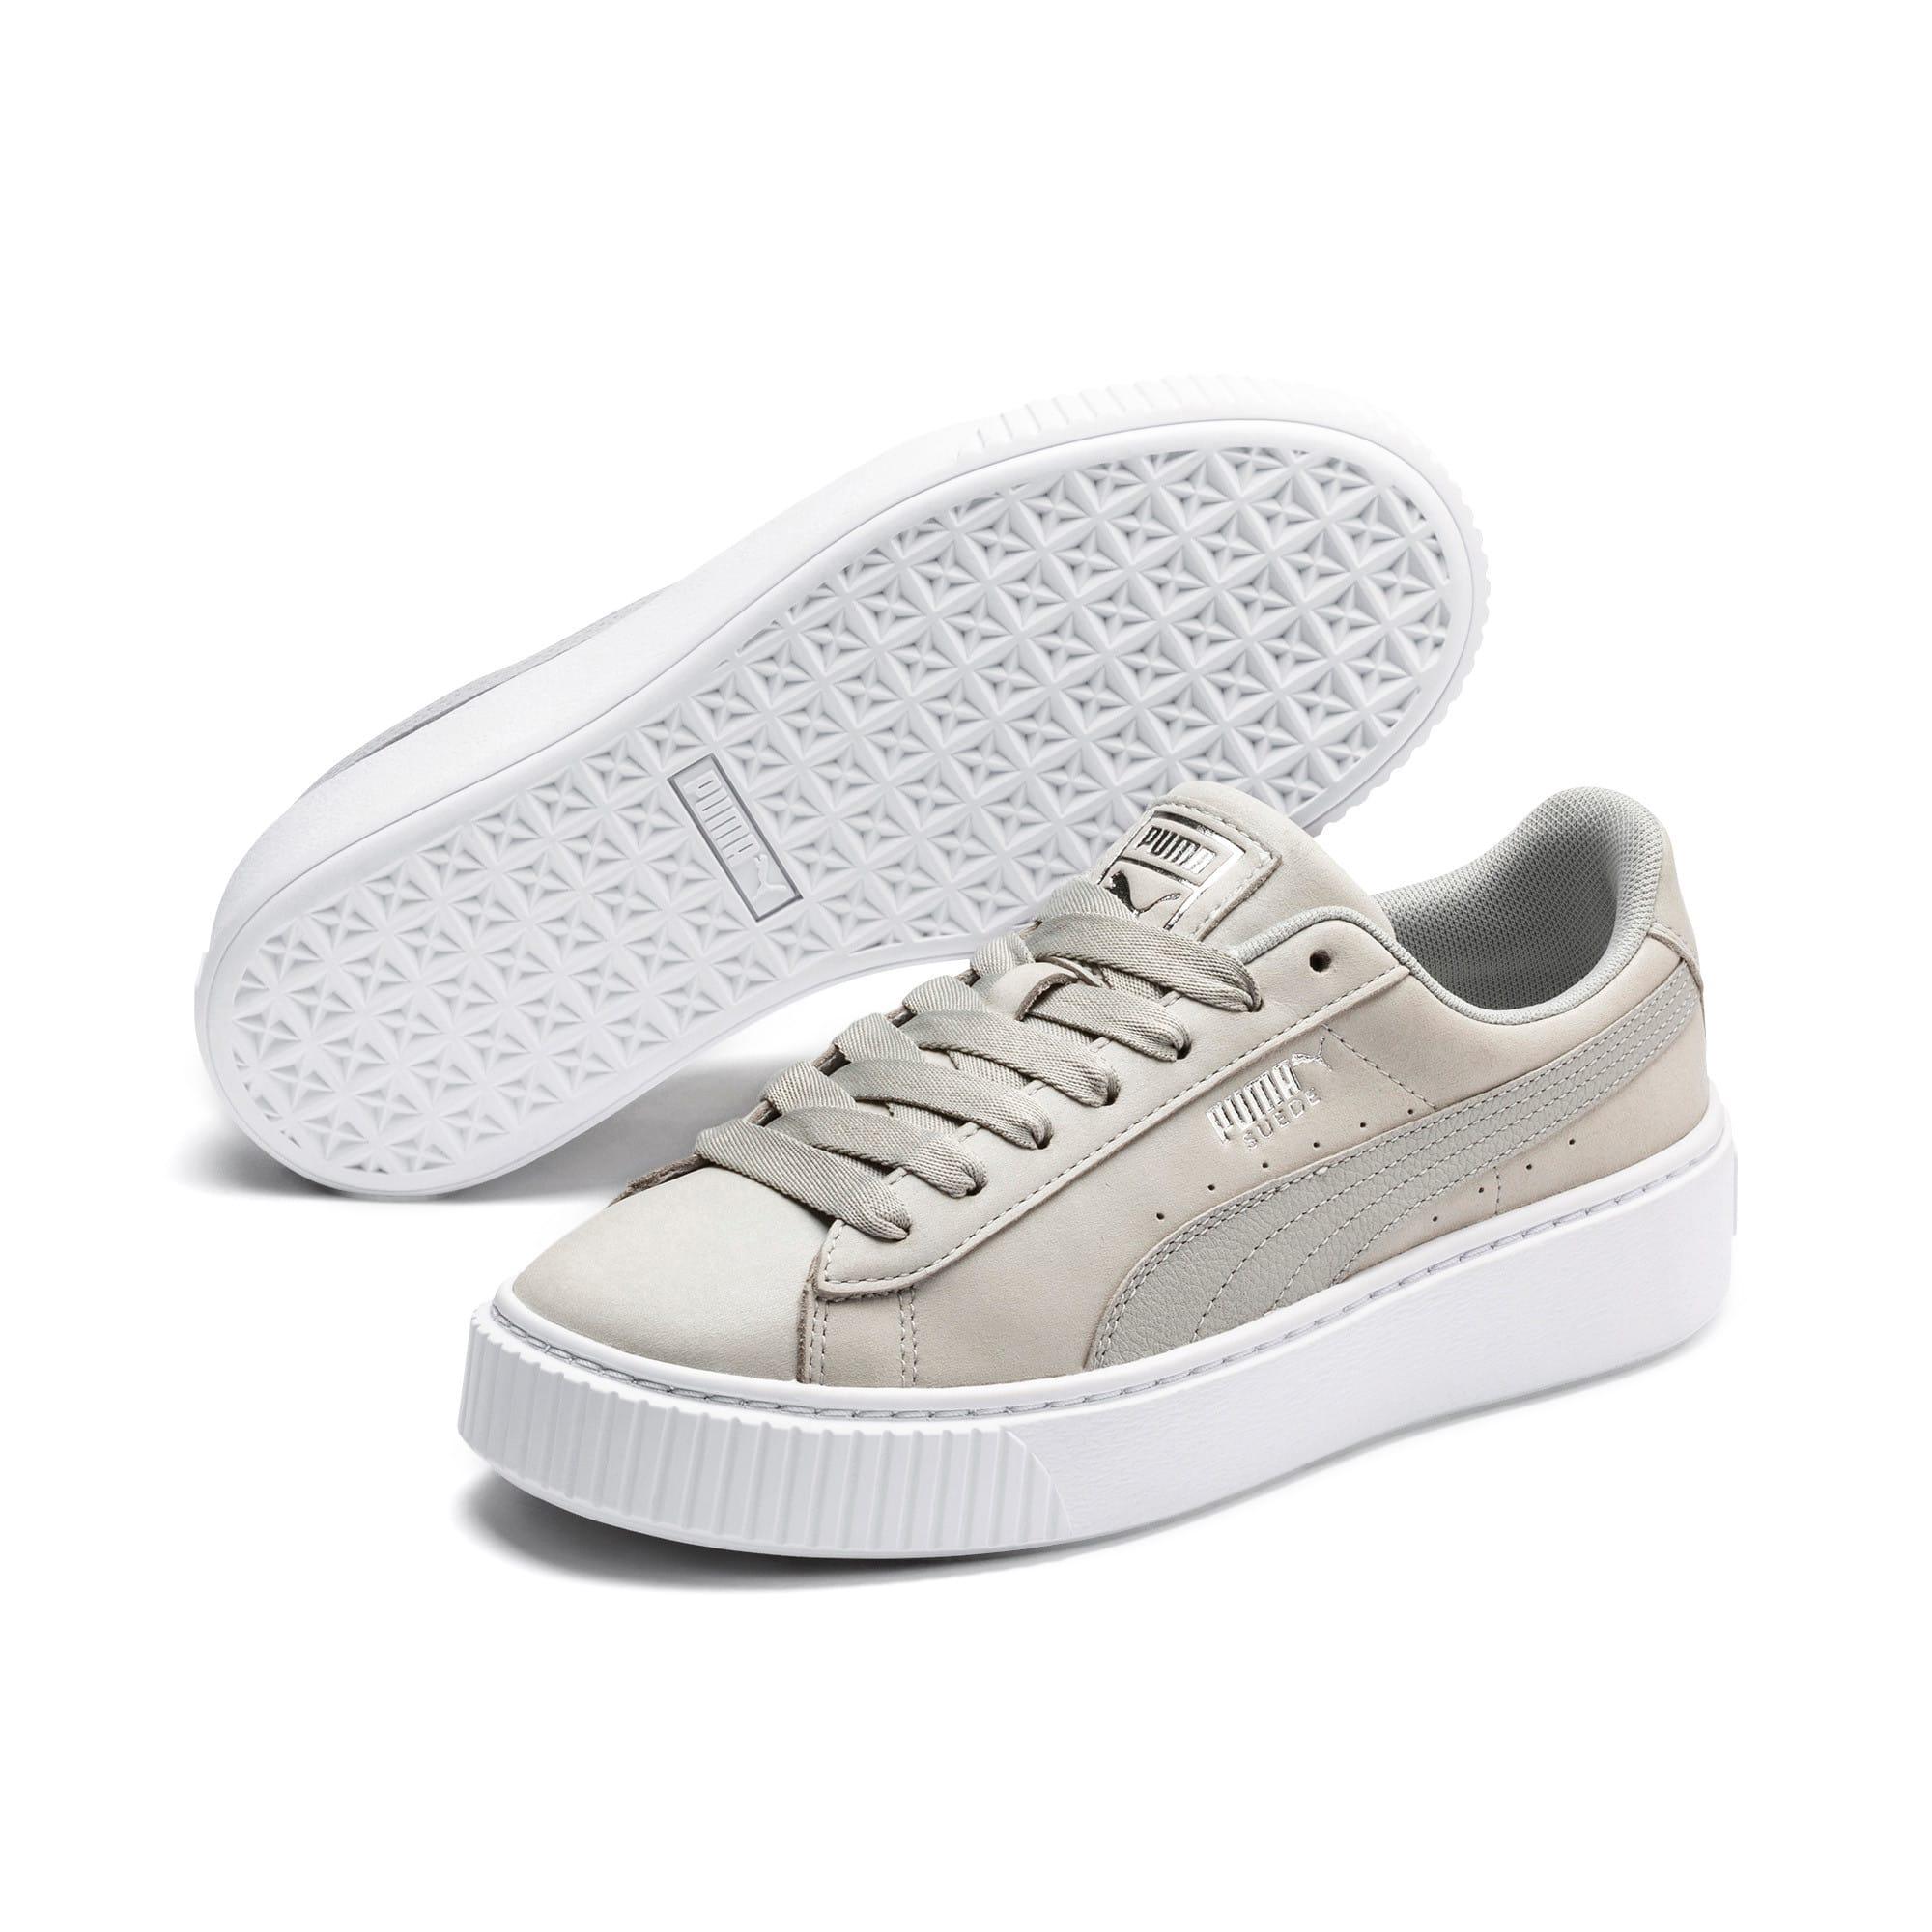 Thumbnail 3 of Suede Platform Shimmer Women's Sneakers, Gray Violet-Puma White, medium